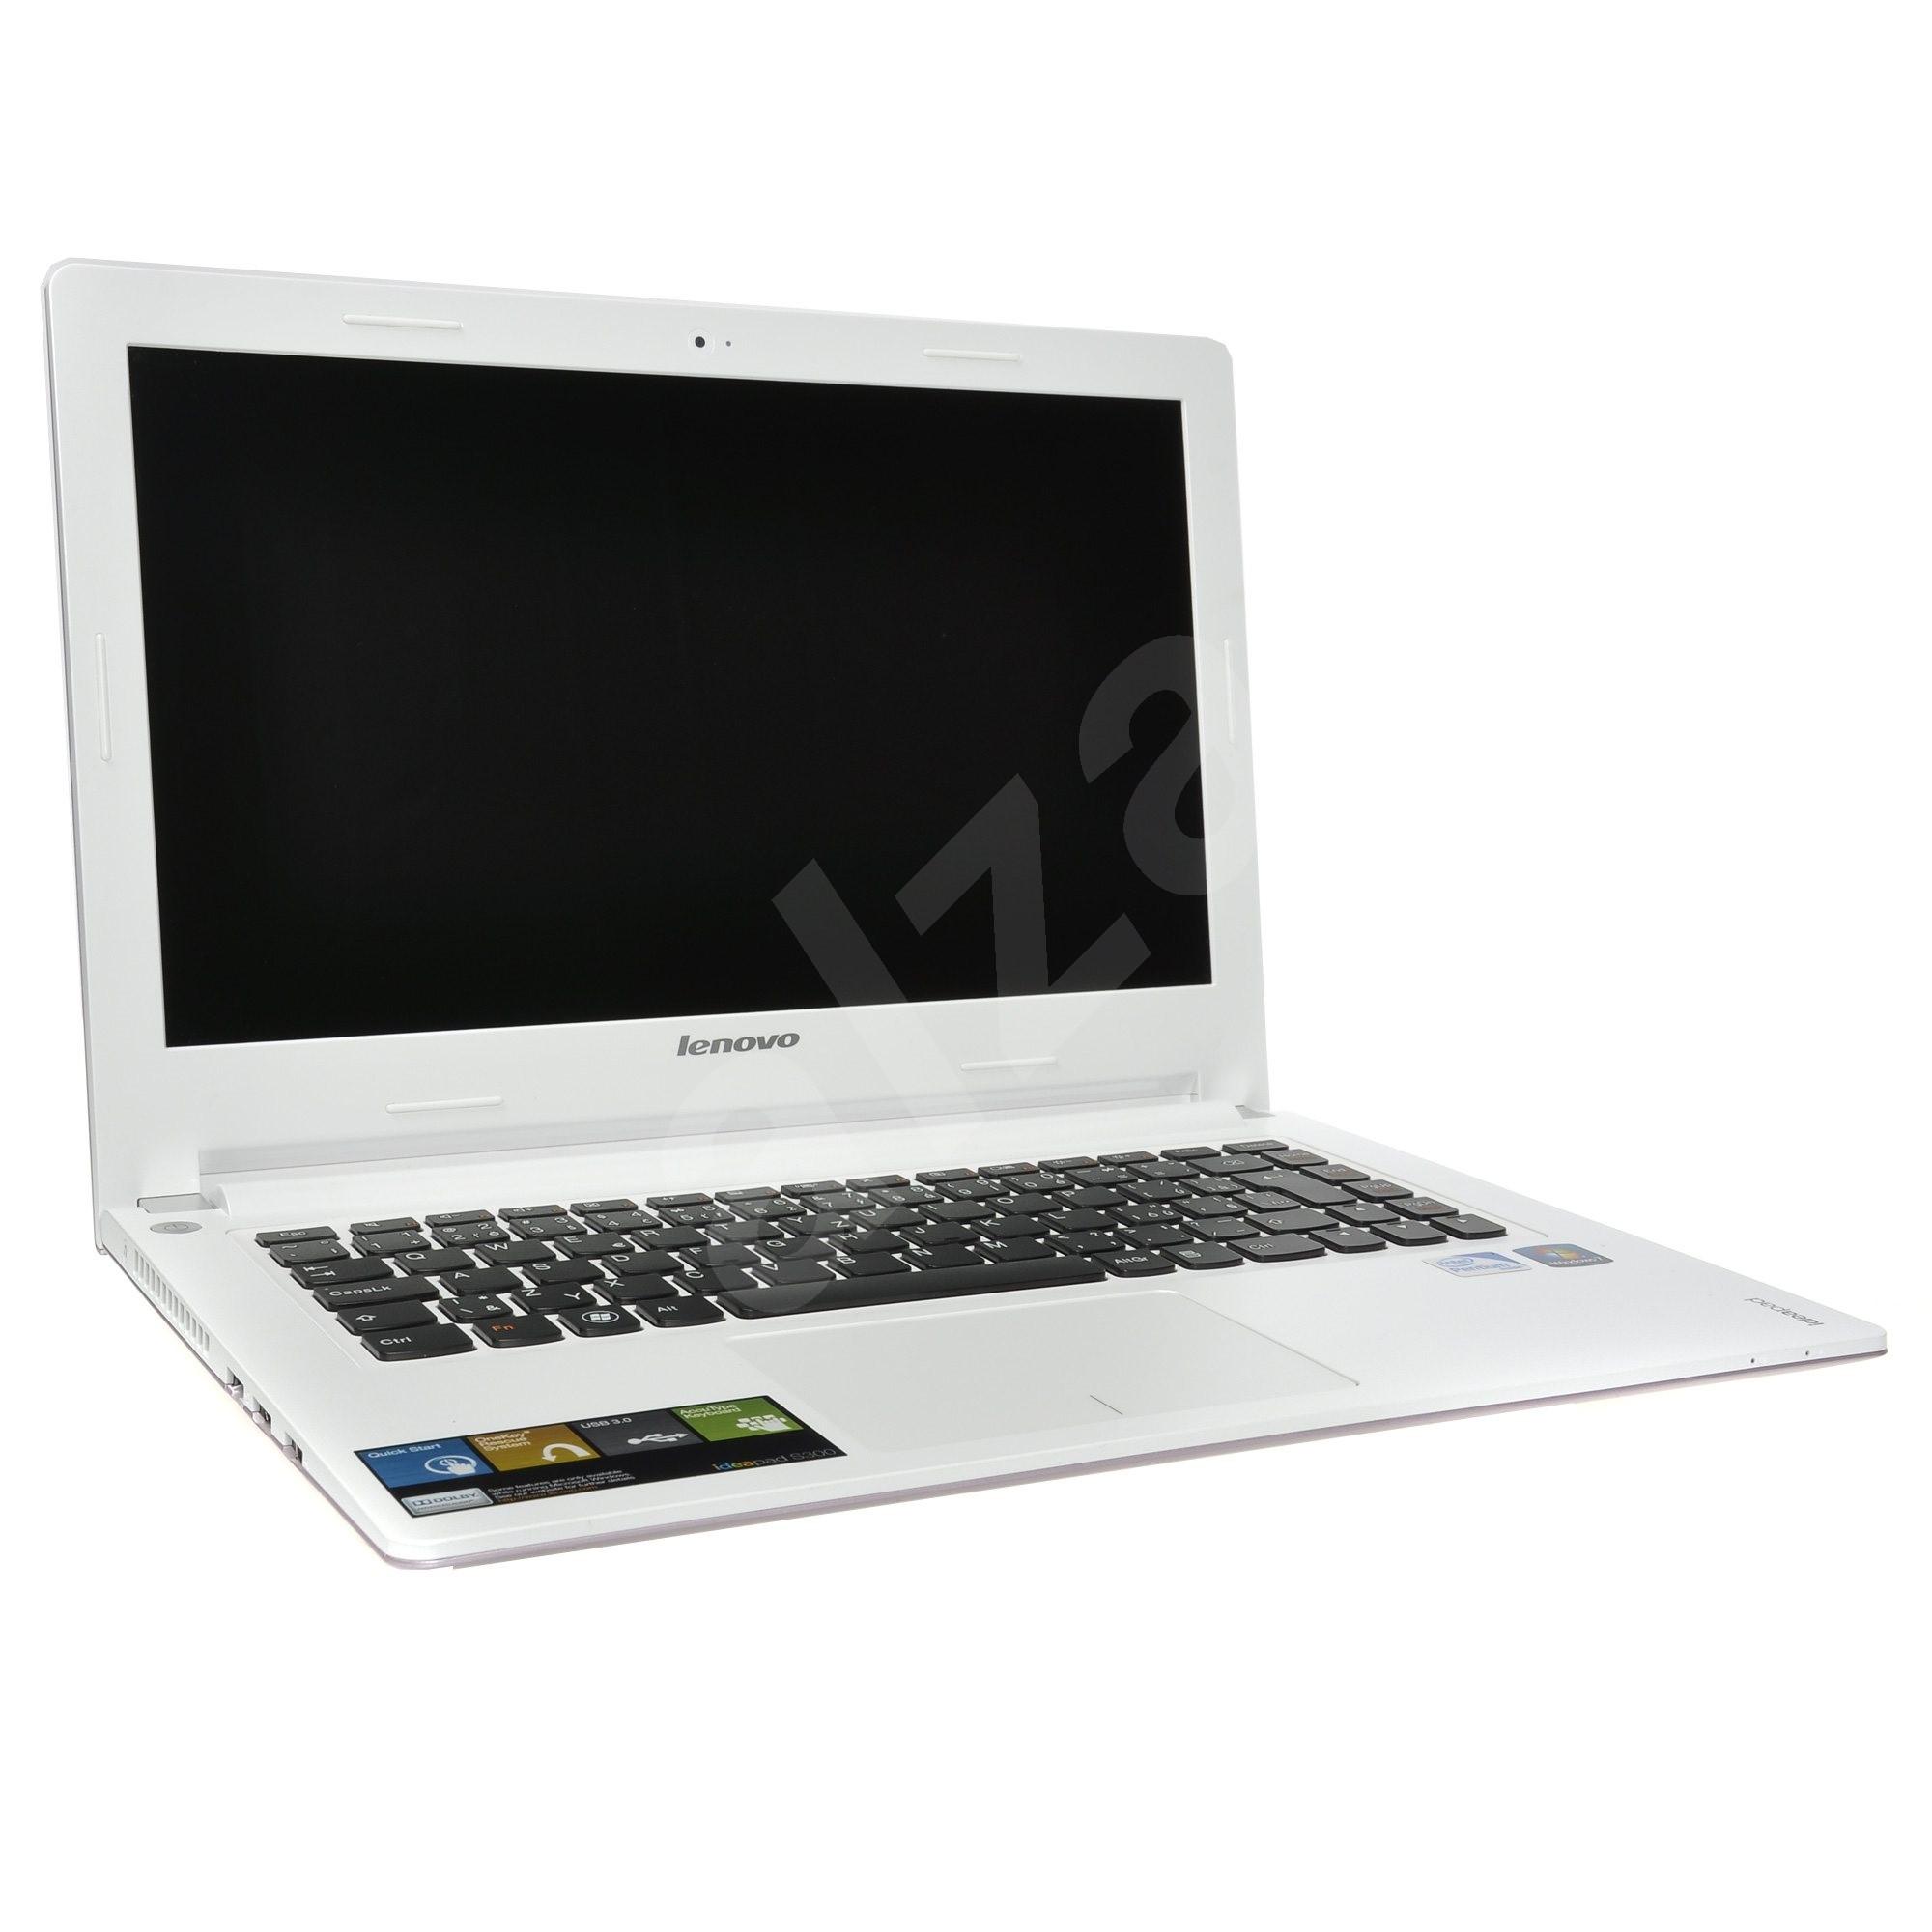 Lenovo IdeaPad S300 Cotton-Candy Pink - Notebook | Alza.cz